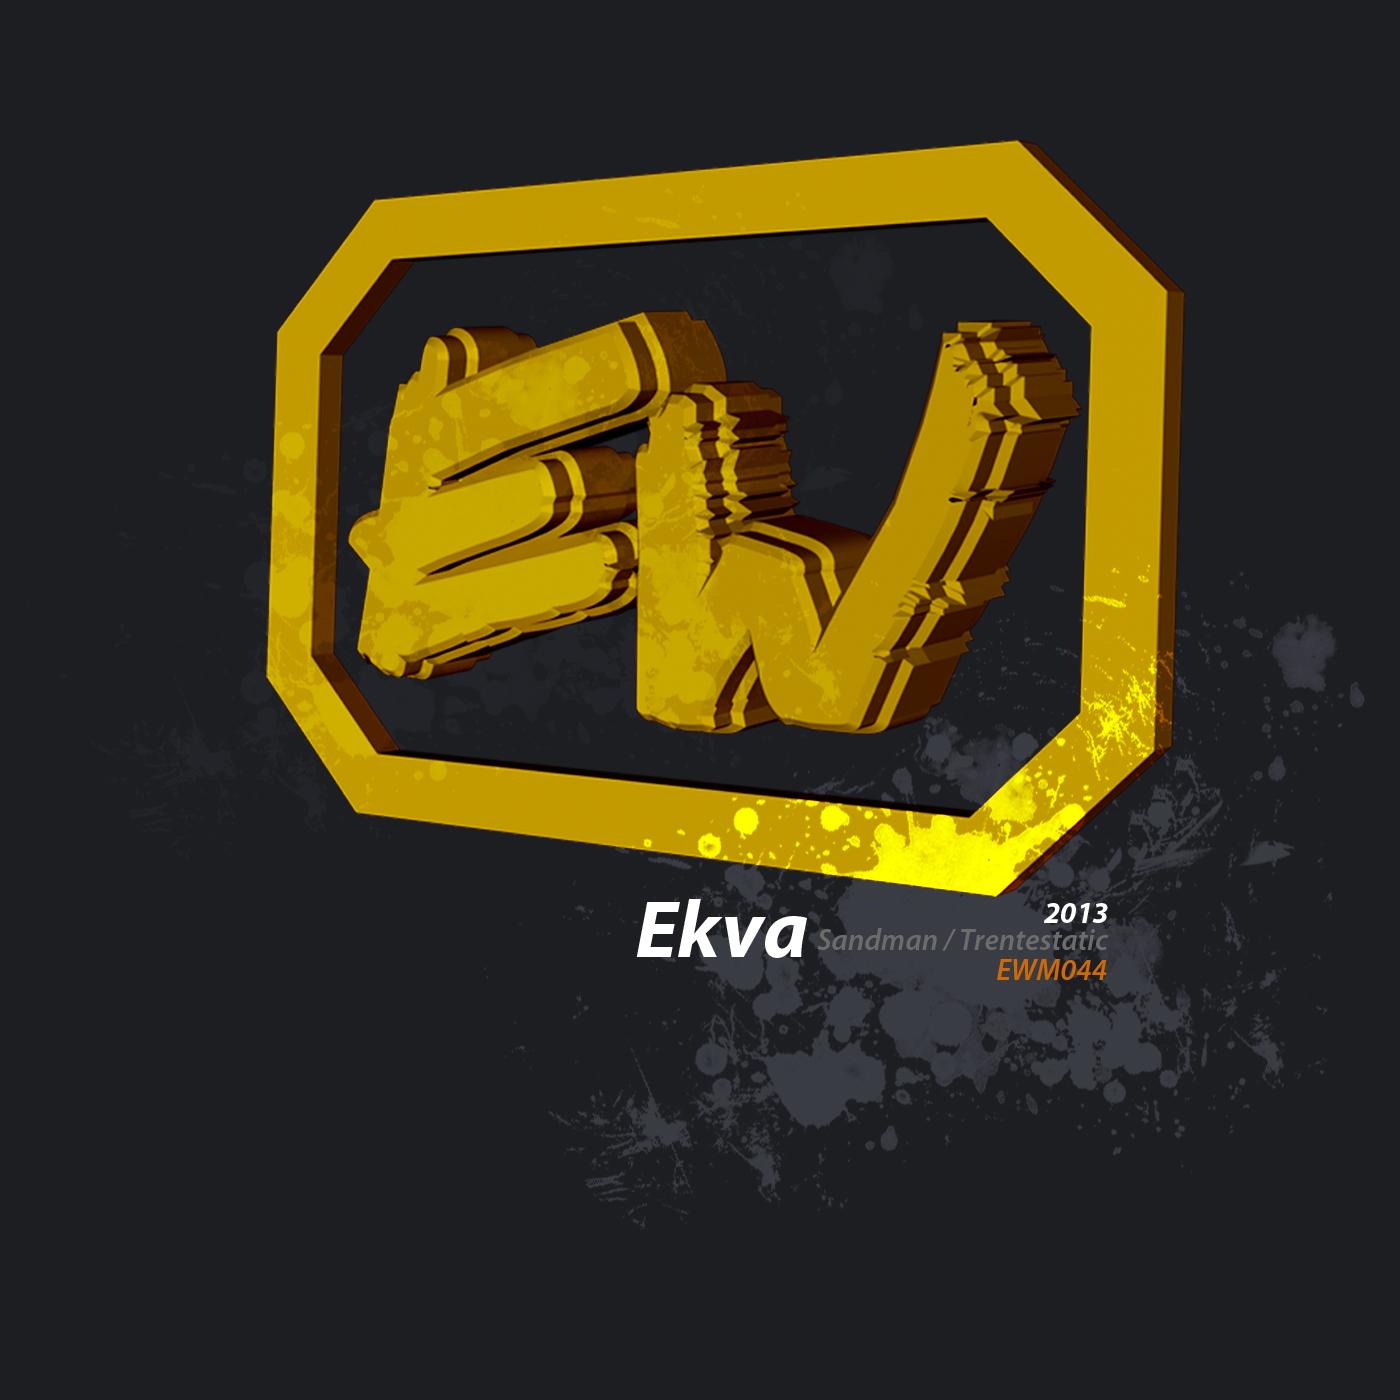 ekva-2012-cover